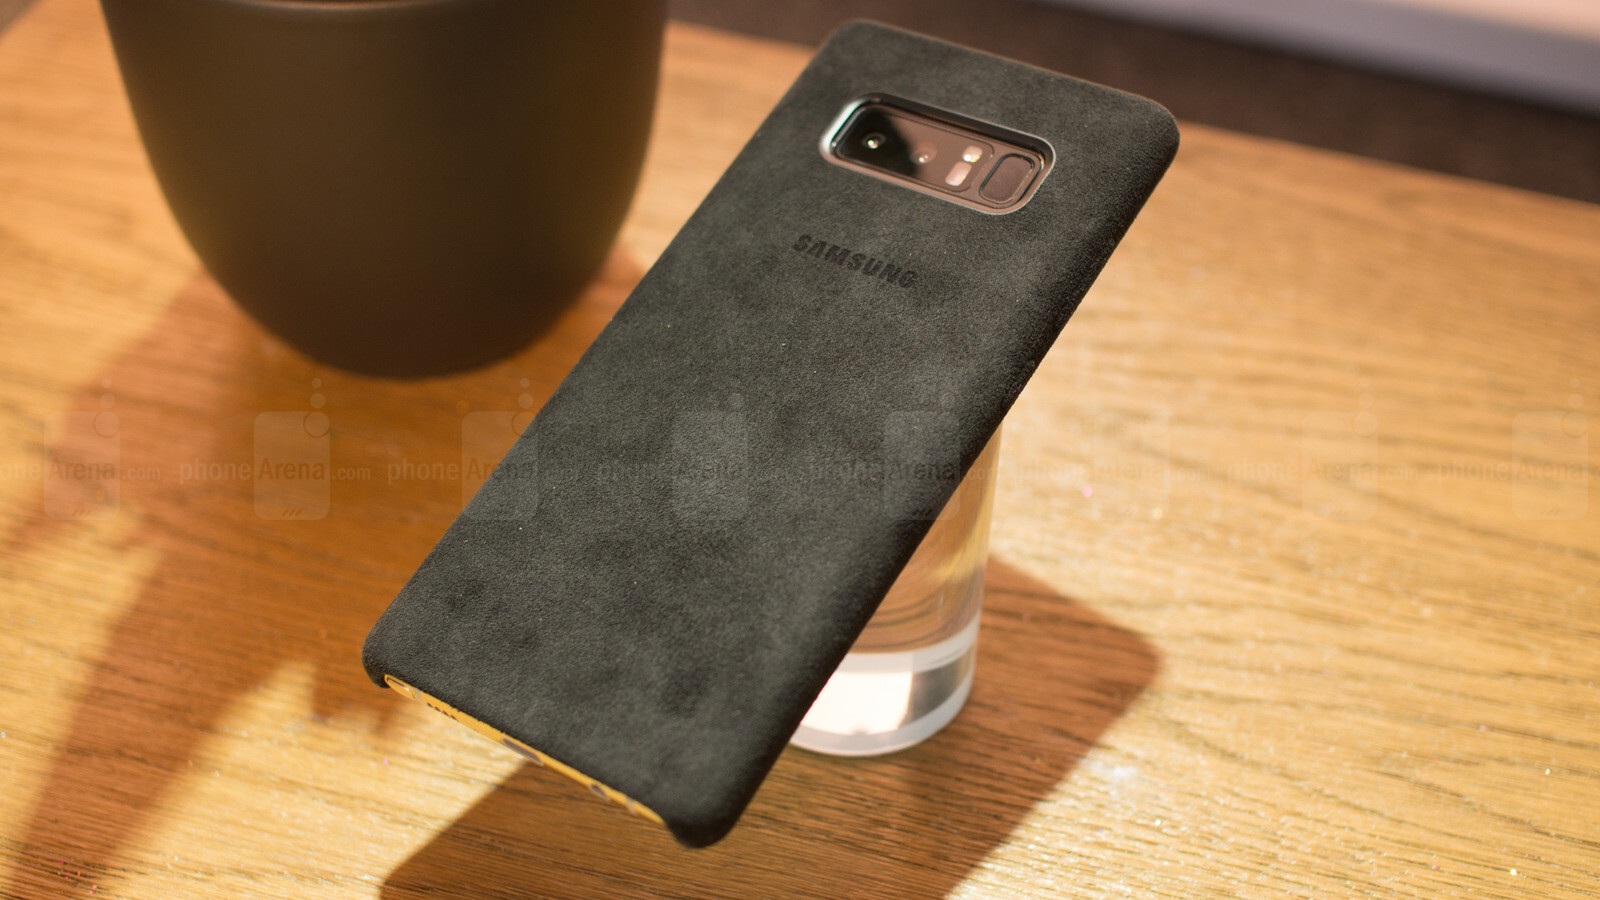 Official Samsung Galaxy Note 8 Alcantara Case Hands On